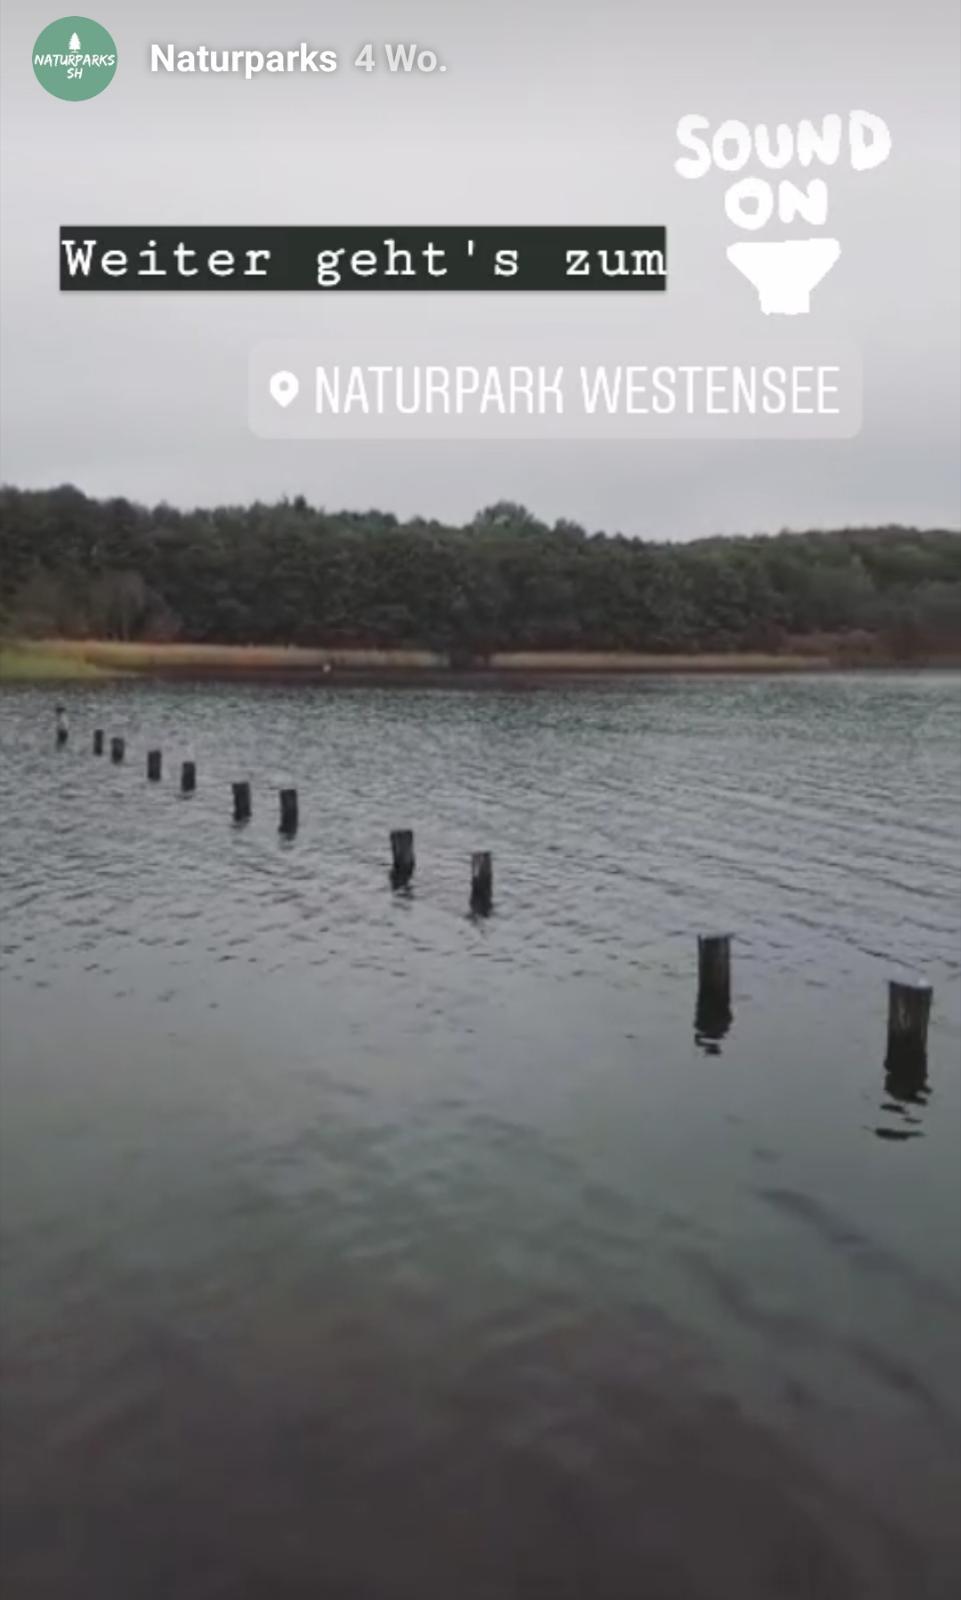 Naturpark Westensee: Naturparks Schleswig-Holstein